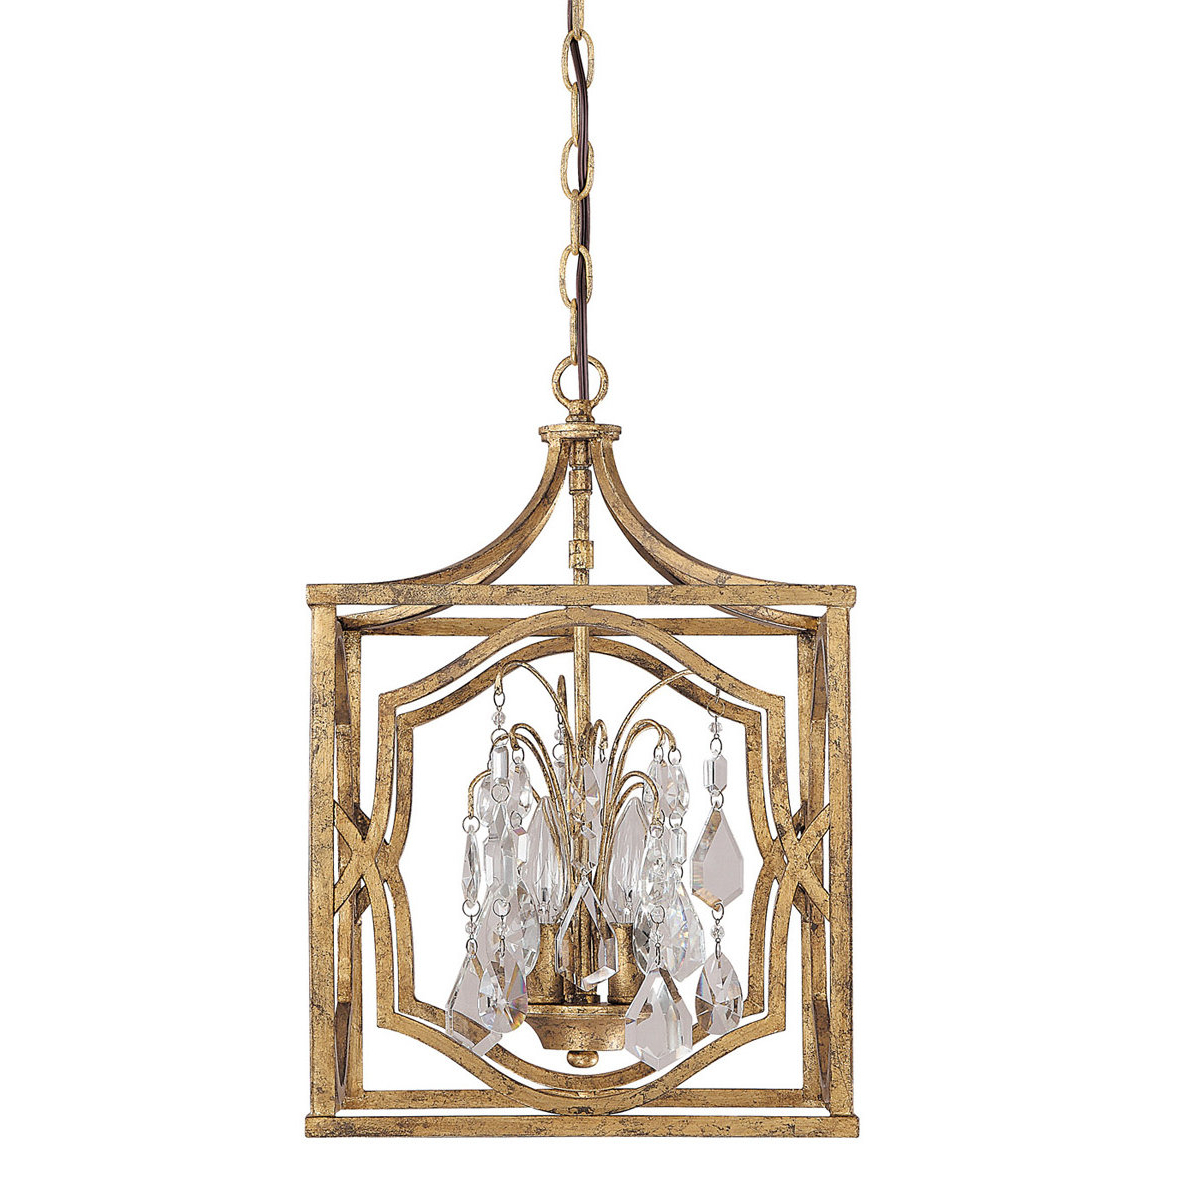 Nisbet 6 Light Lantern Geometric Pendants Intended For Best And Newest Willa Arlo Interiors Destrey 3 Light Lantern Pendant (View 19 of 20)